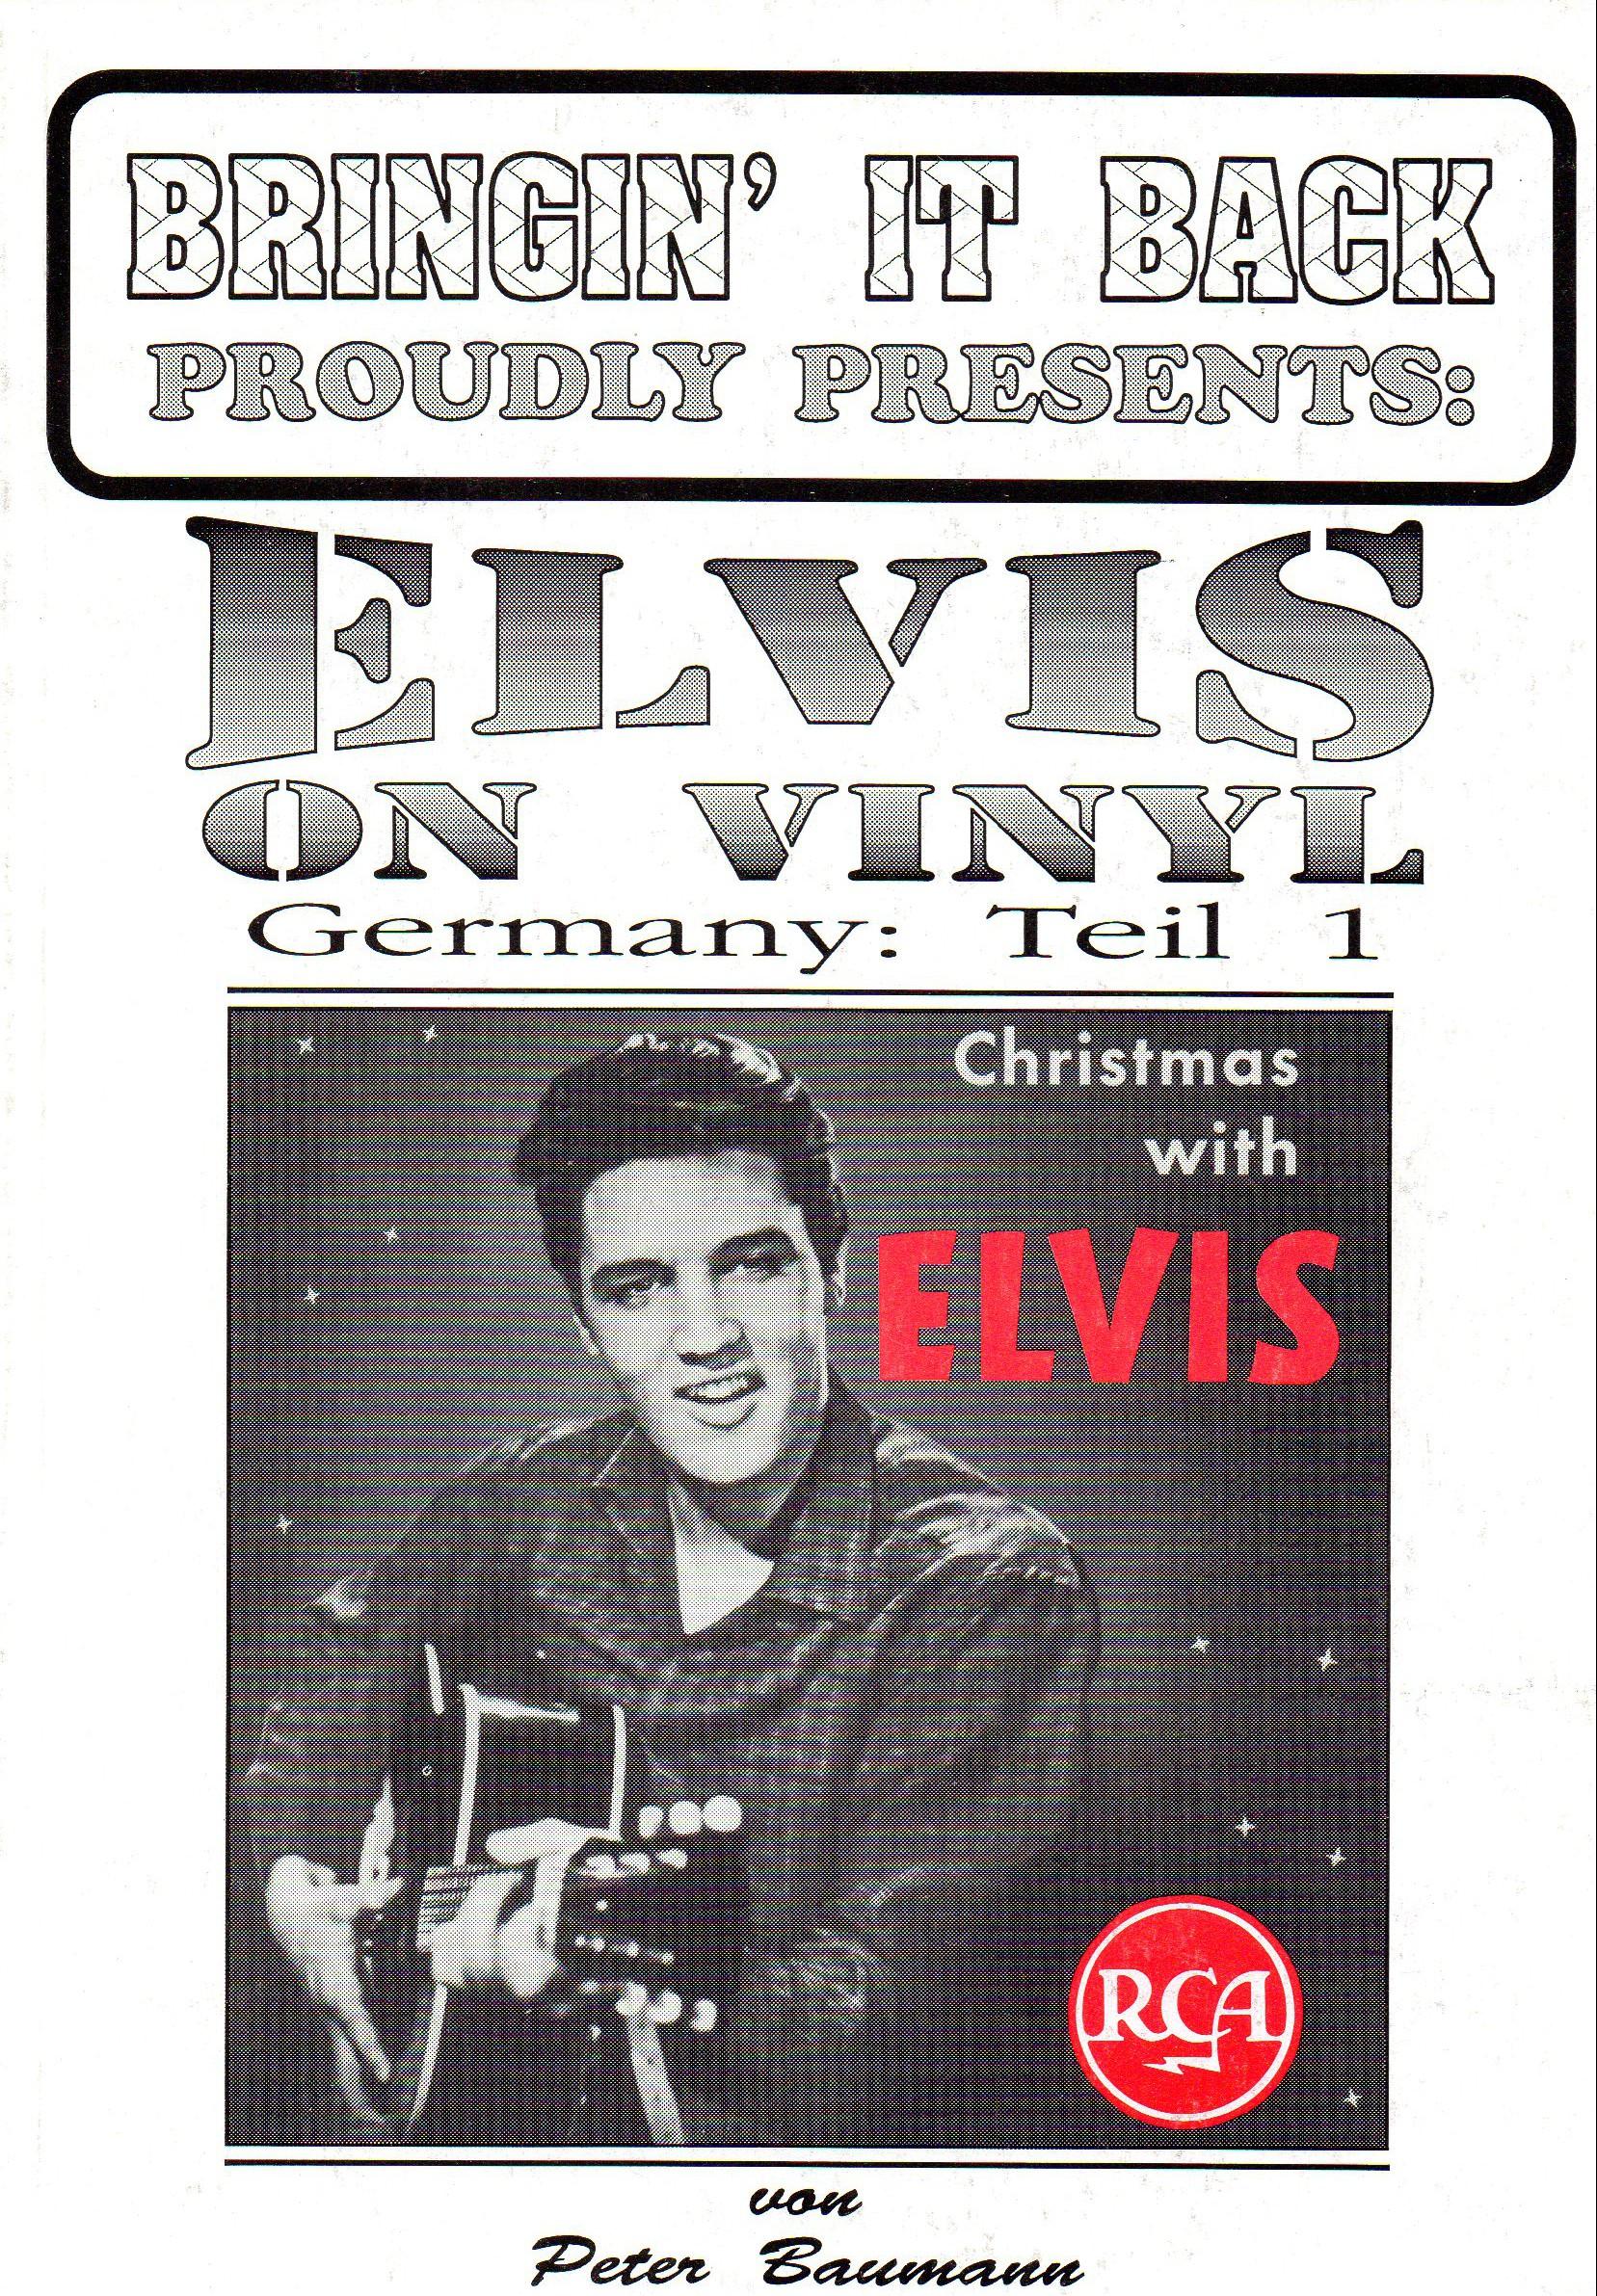 vinyl - ELVIS ON VINYL Teil 1 01frontlkjb6